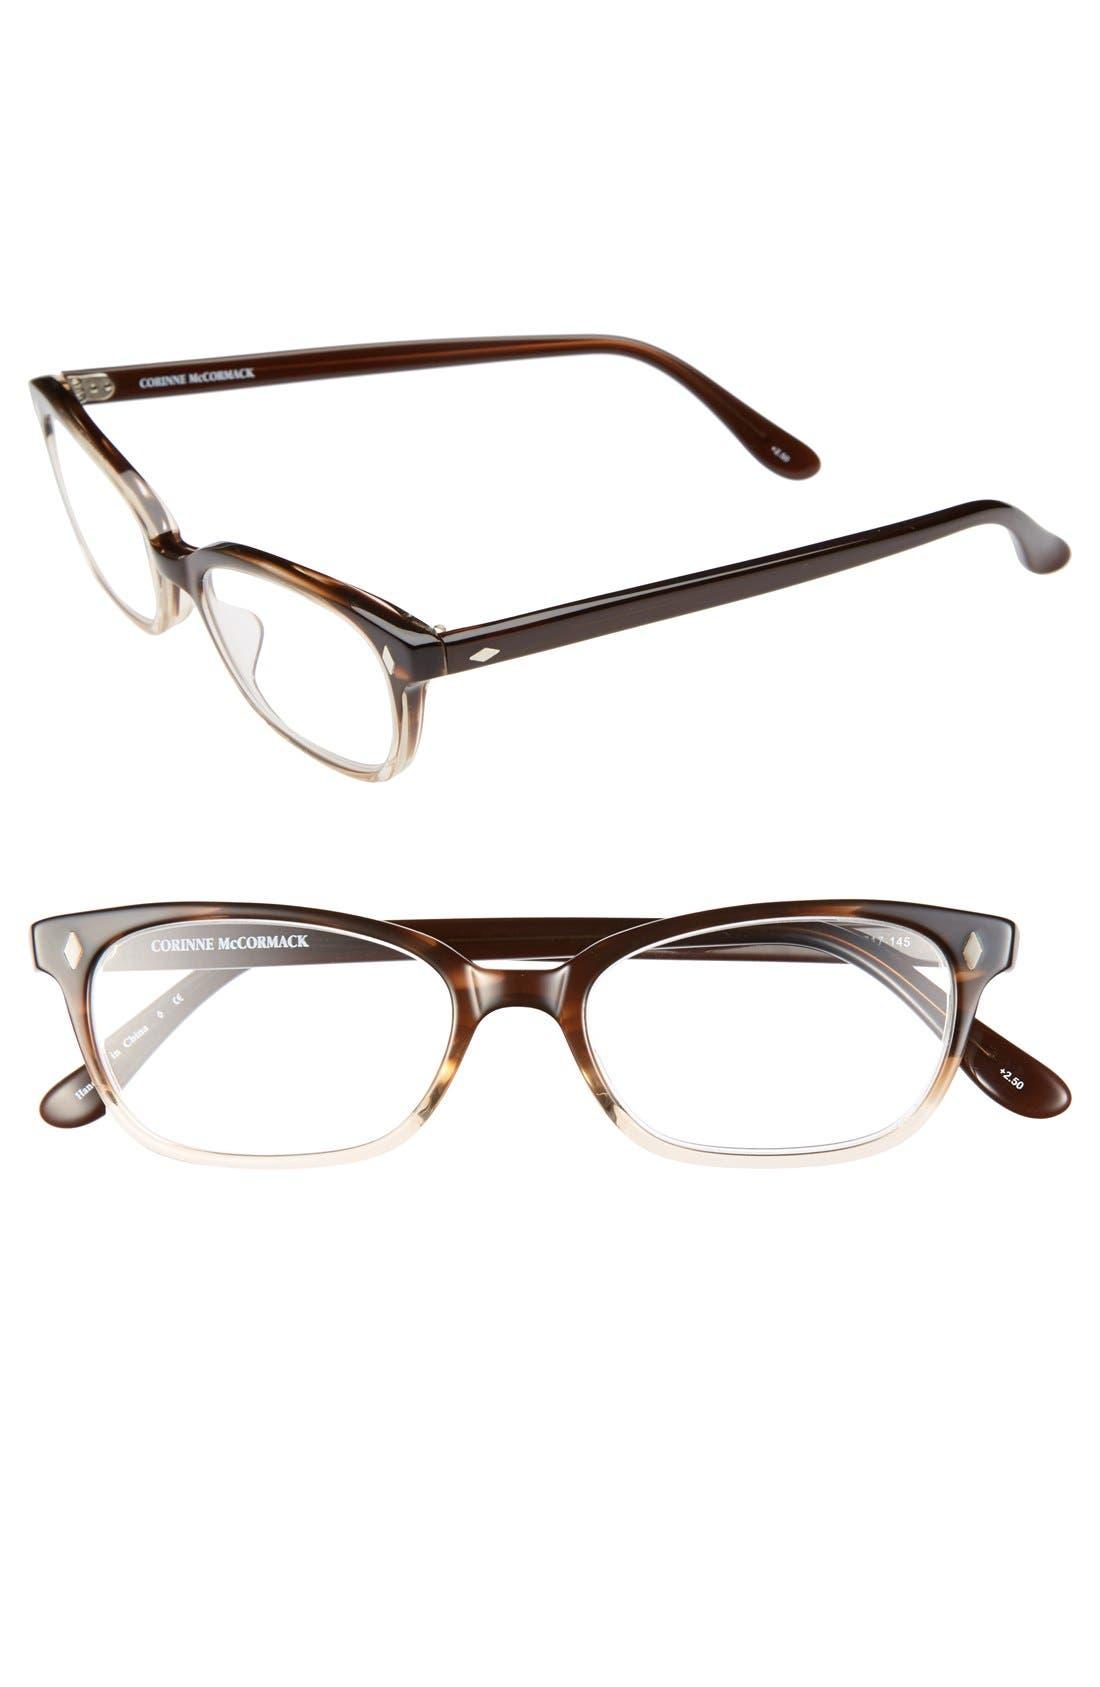 Alternate Image 1 Selected - Corinne McCormack 50mm Reading Glasses (2 for $88)